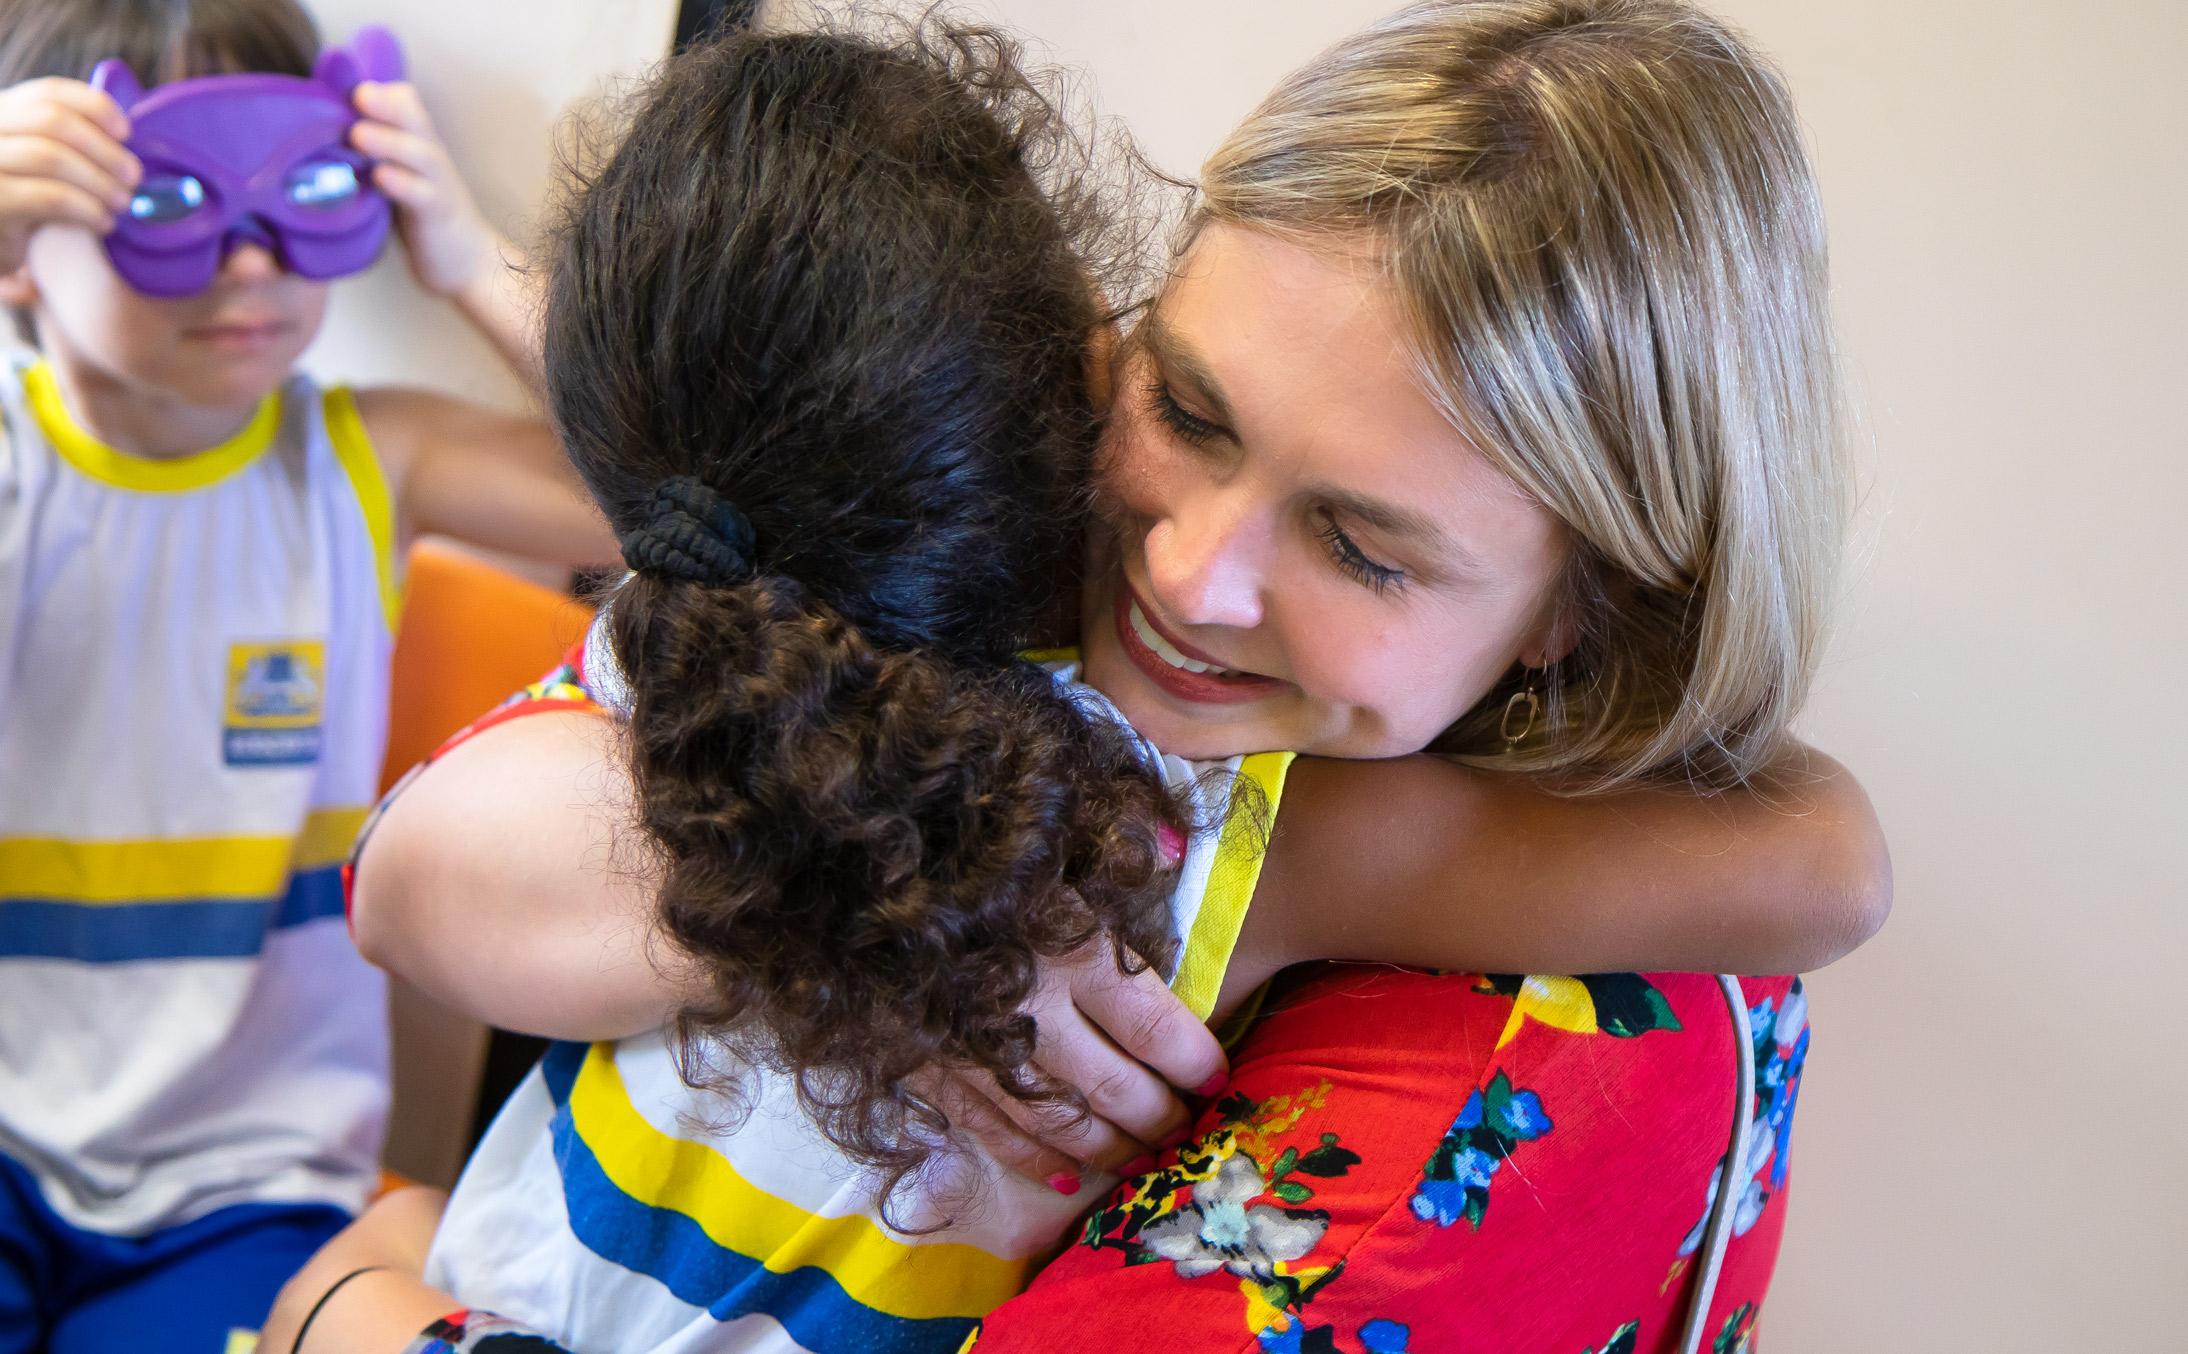 A female adult hugs a child at a nursery school in Brazil.